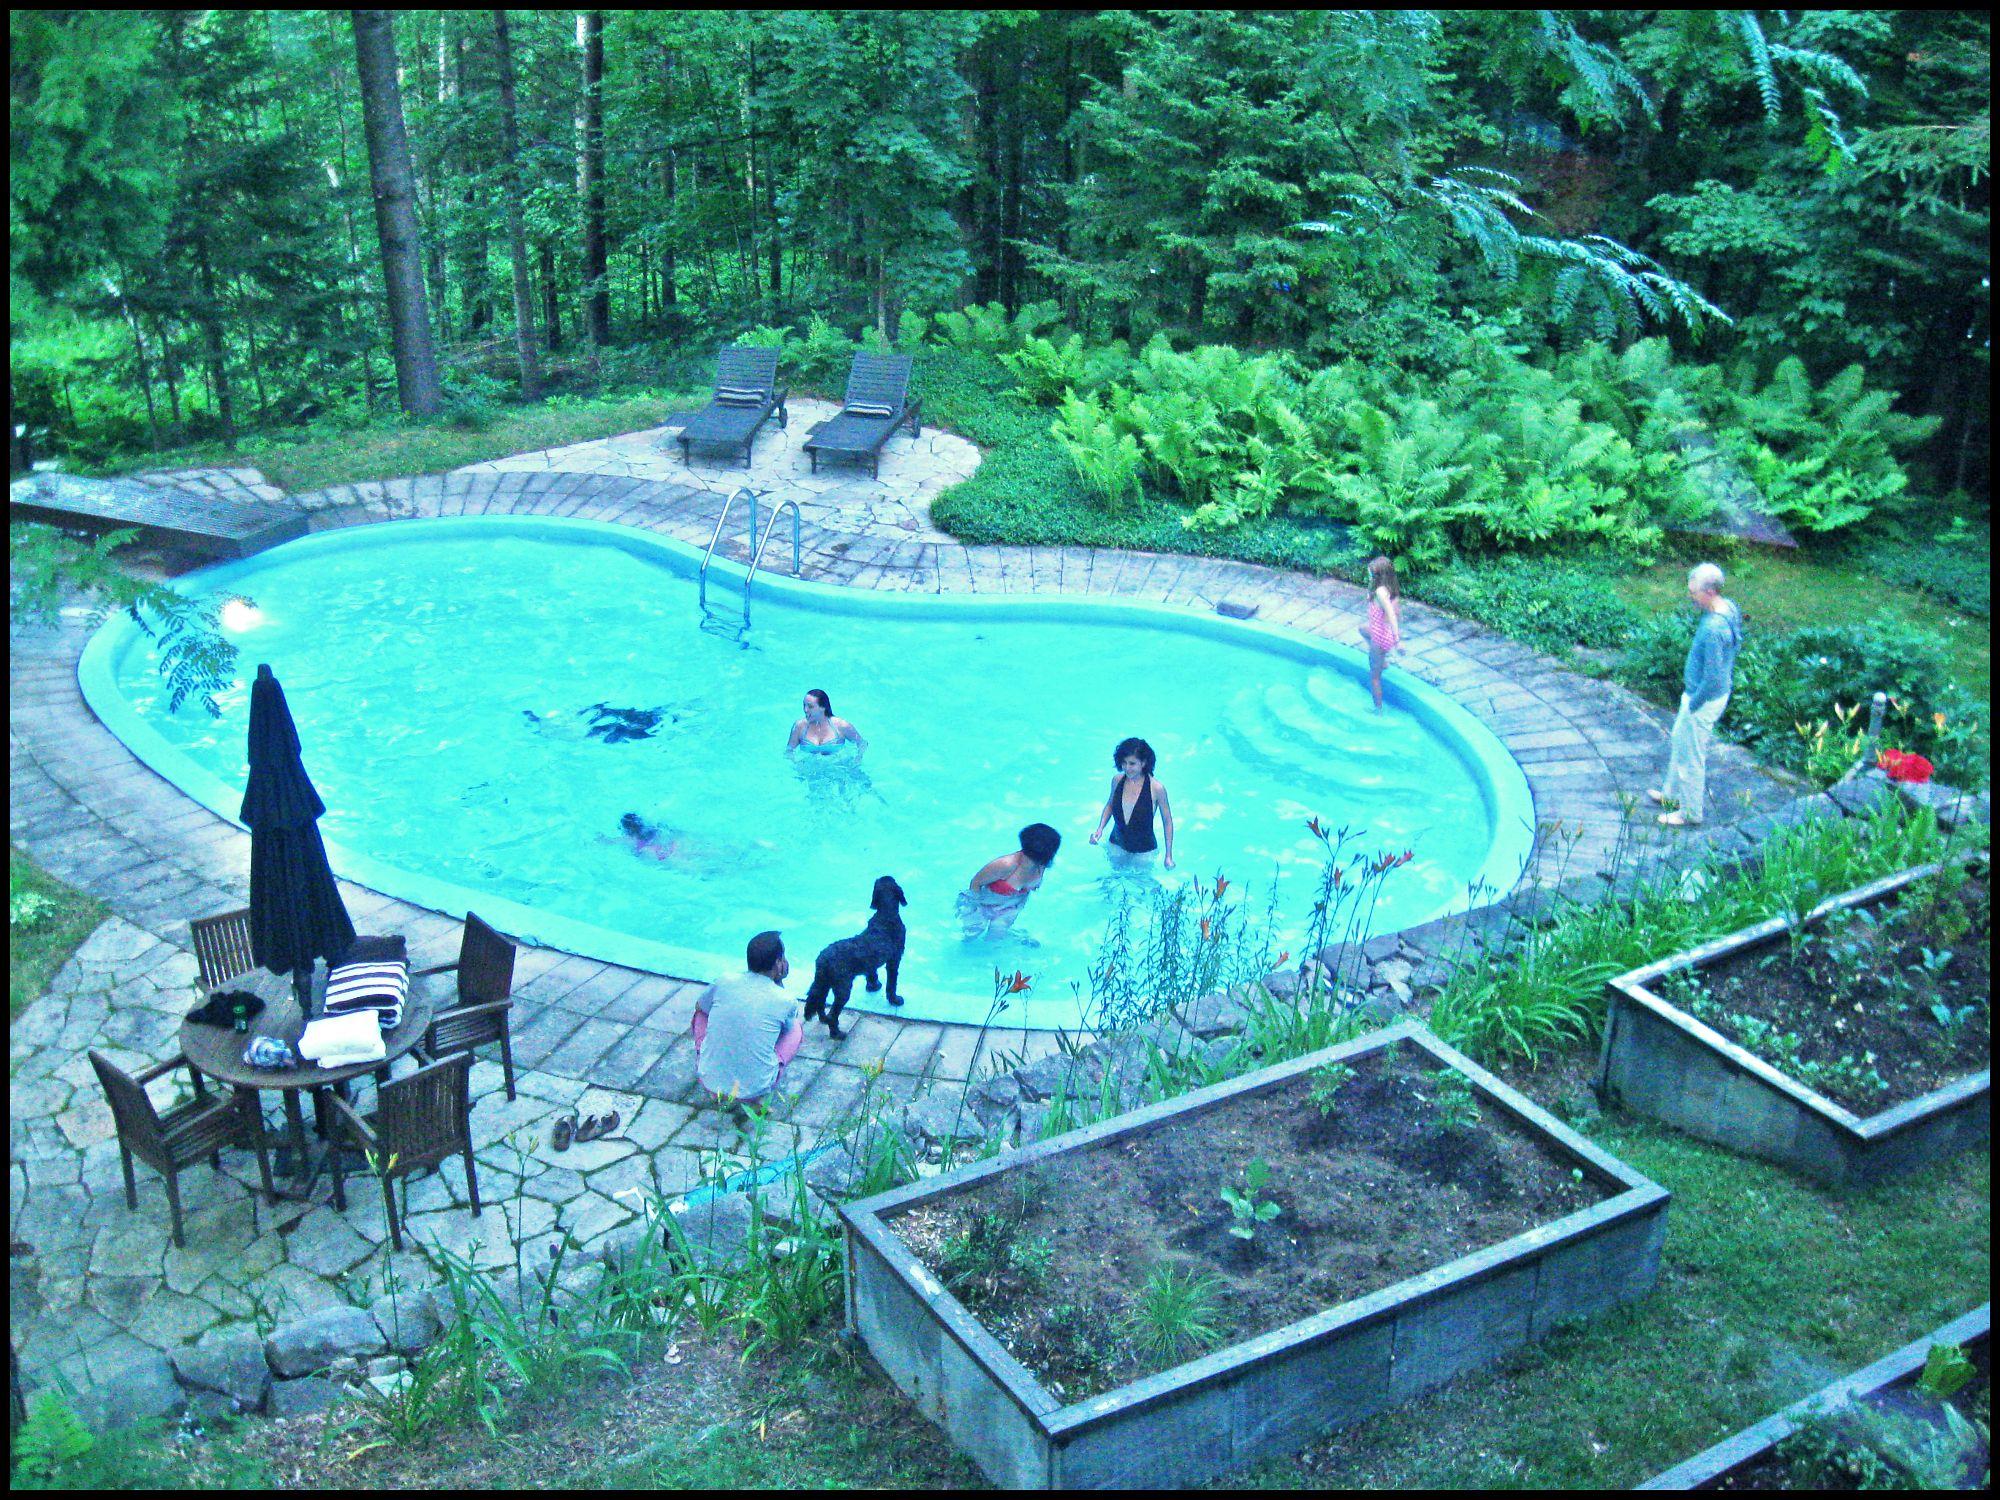 BeFunky_jess pool.jpg.jpg